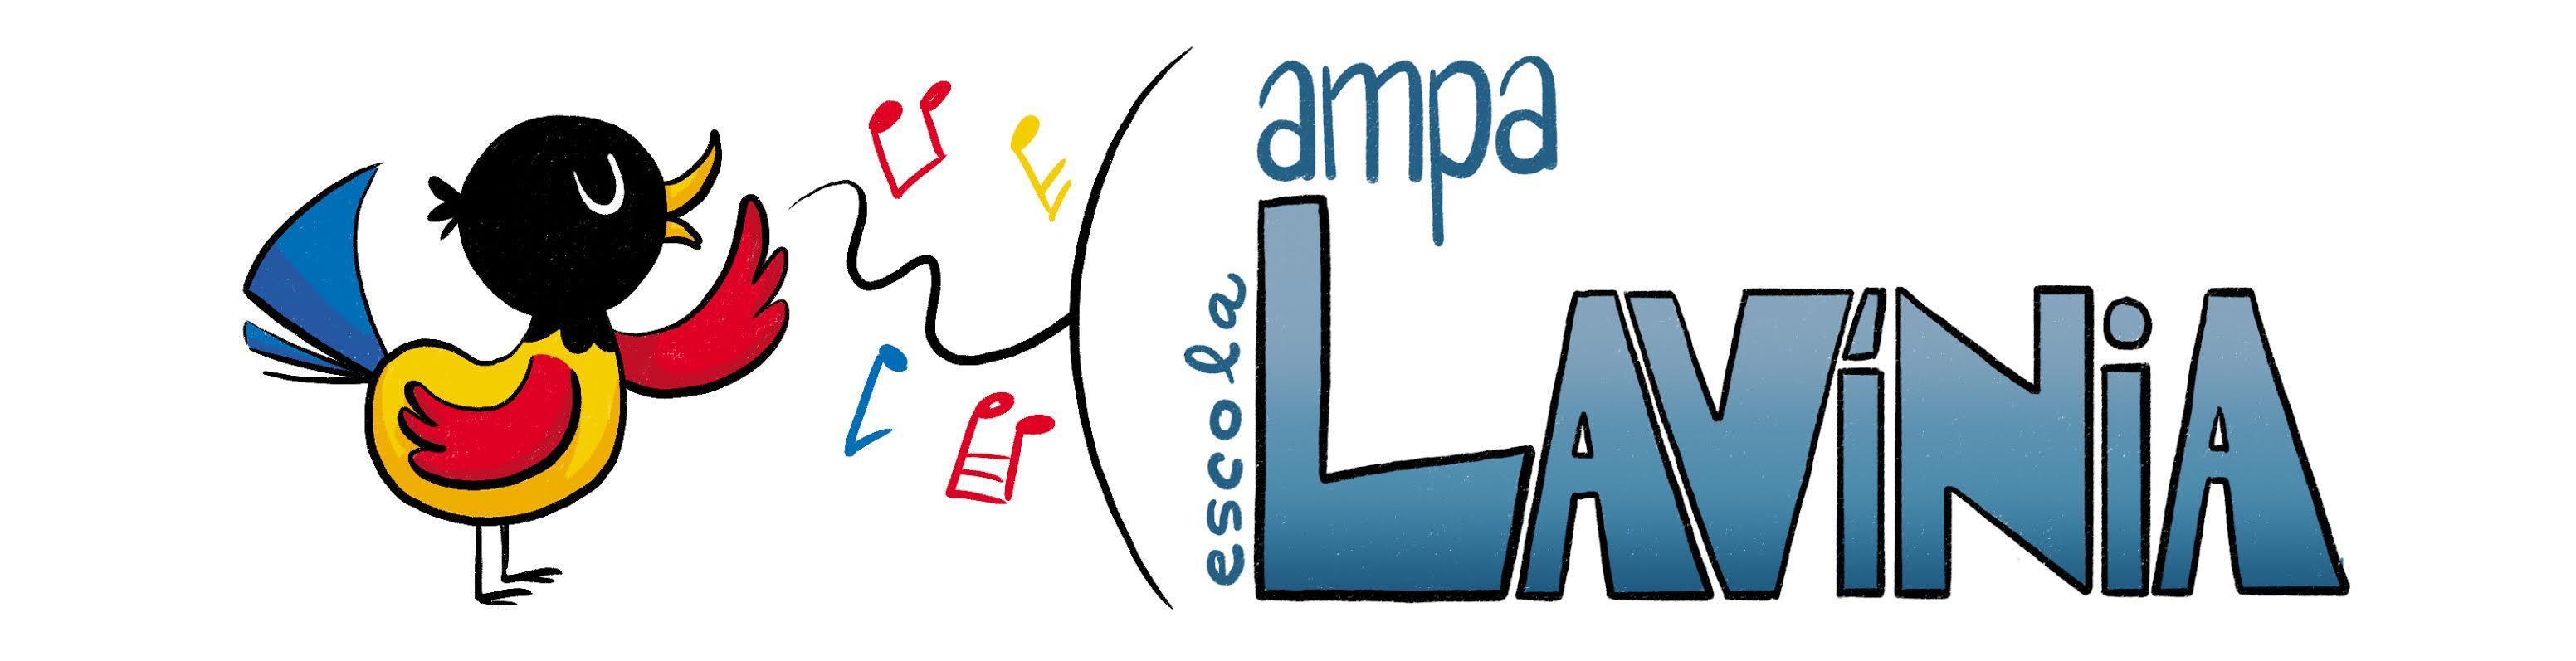 Ampa Lavínia